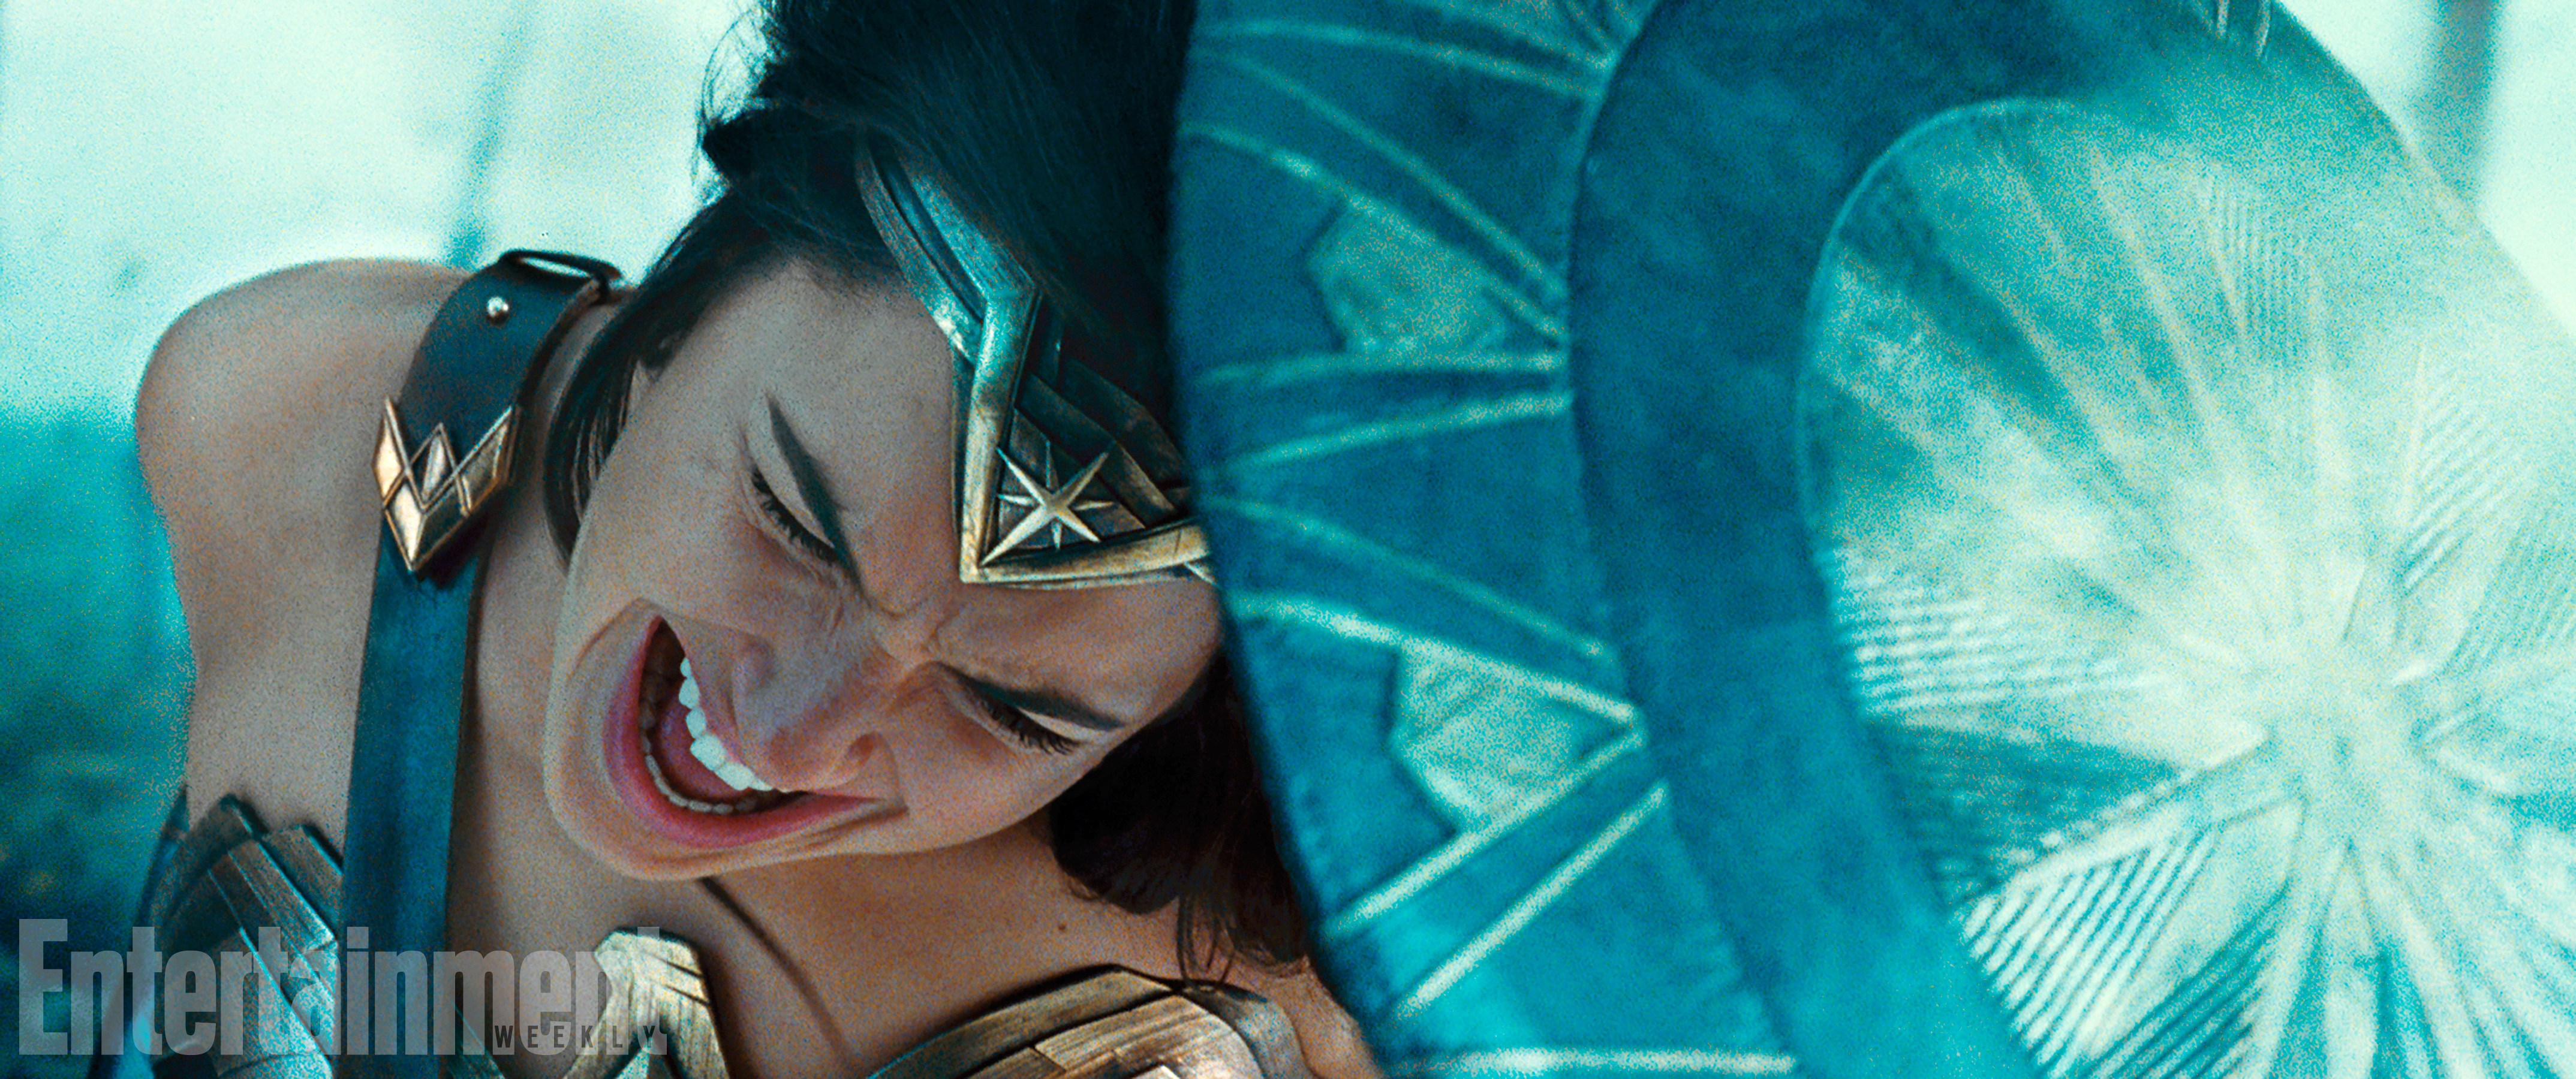 Gal Gadot (Diana Prince/Wonder Woman)